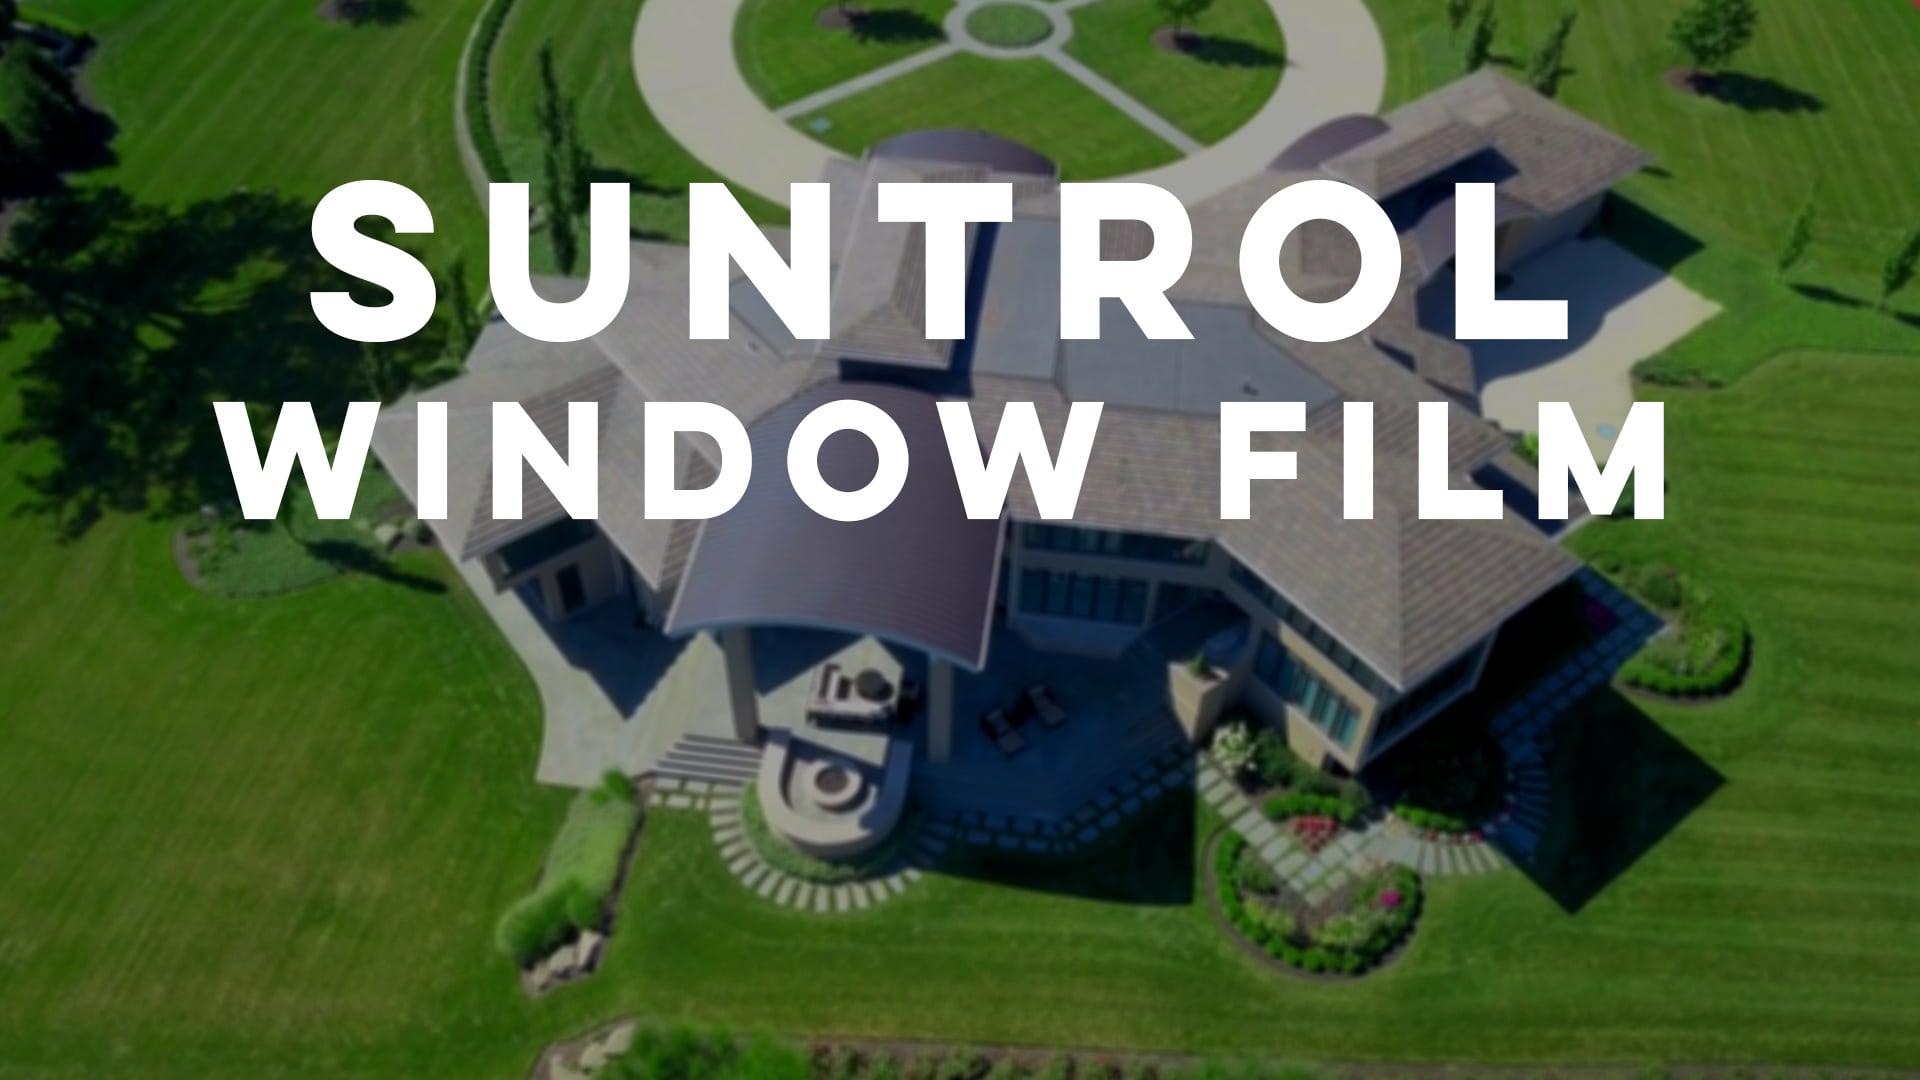 Suntrol   Window Film Overview